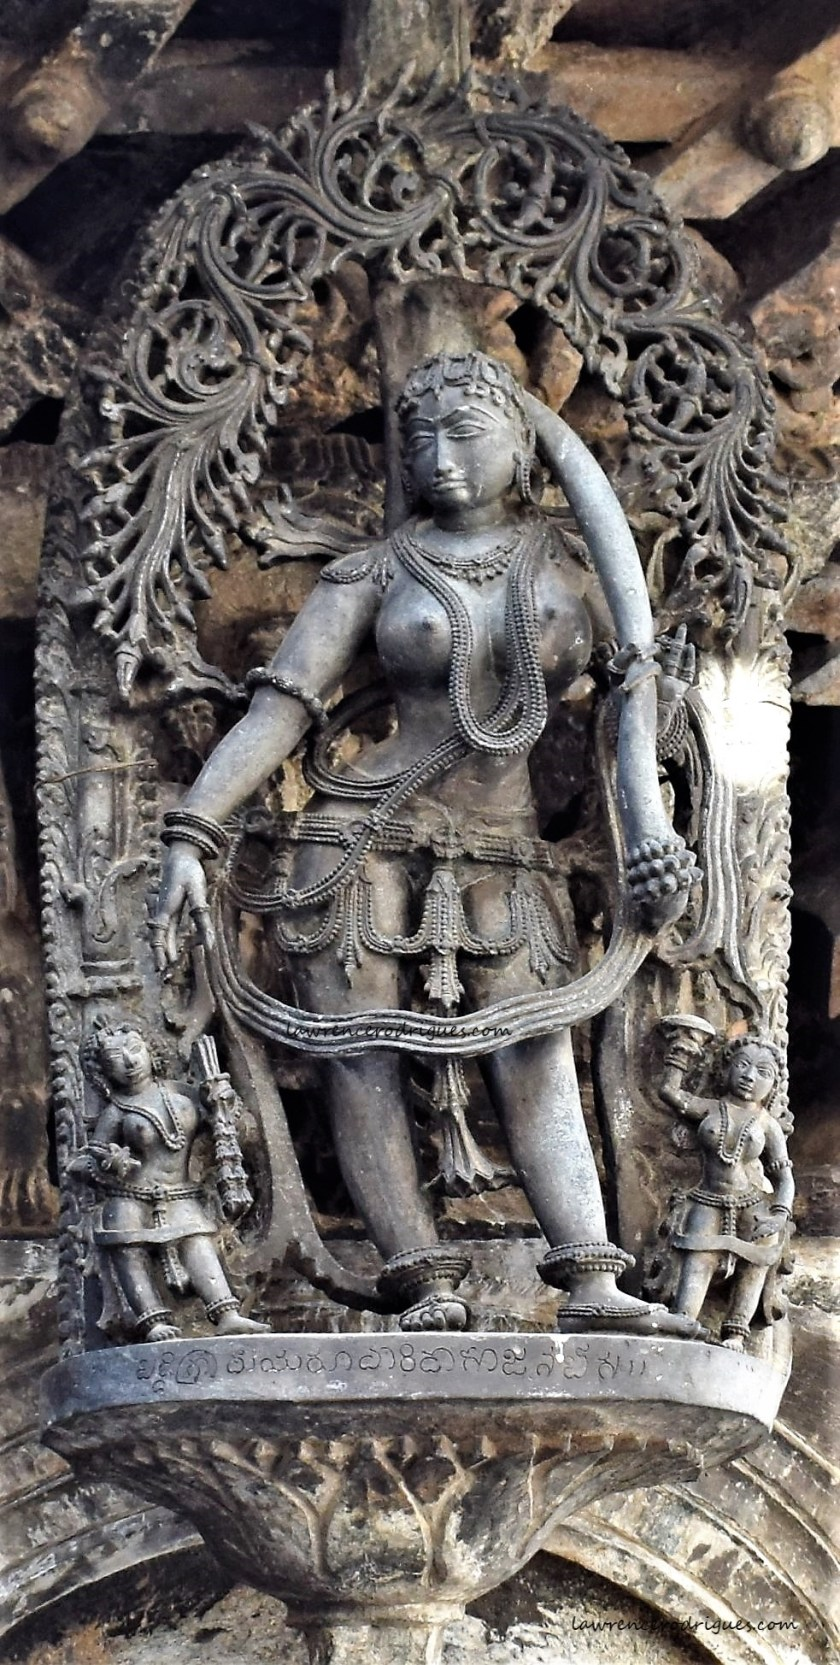 Kesha Sundari - Madanike styling her long hair -A bracket figure mounterd on the exterior wall of the Belur Chennakeshava Temple in Karnataka, India